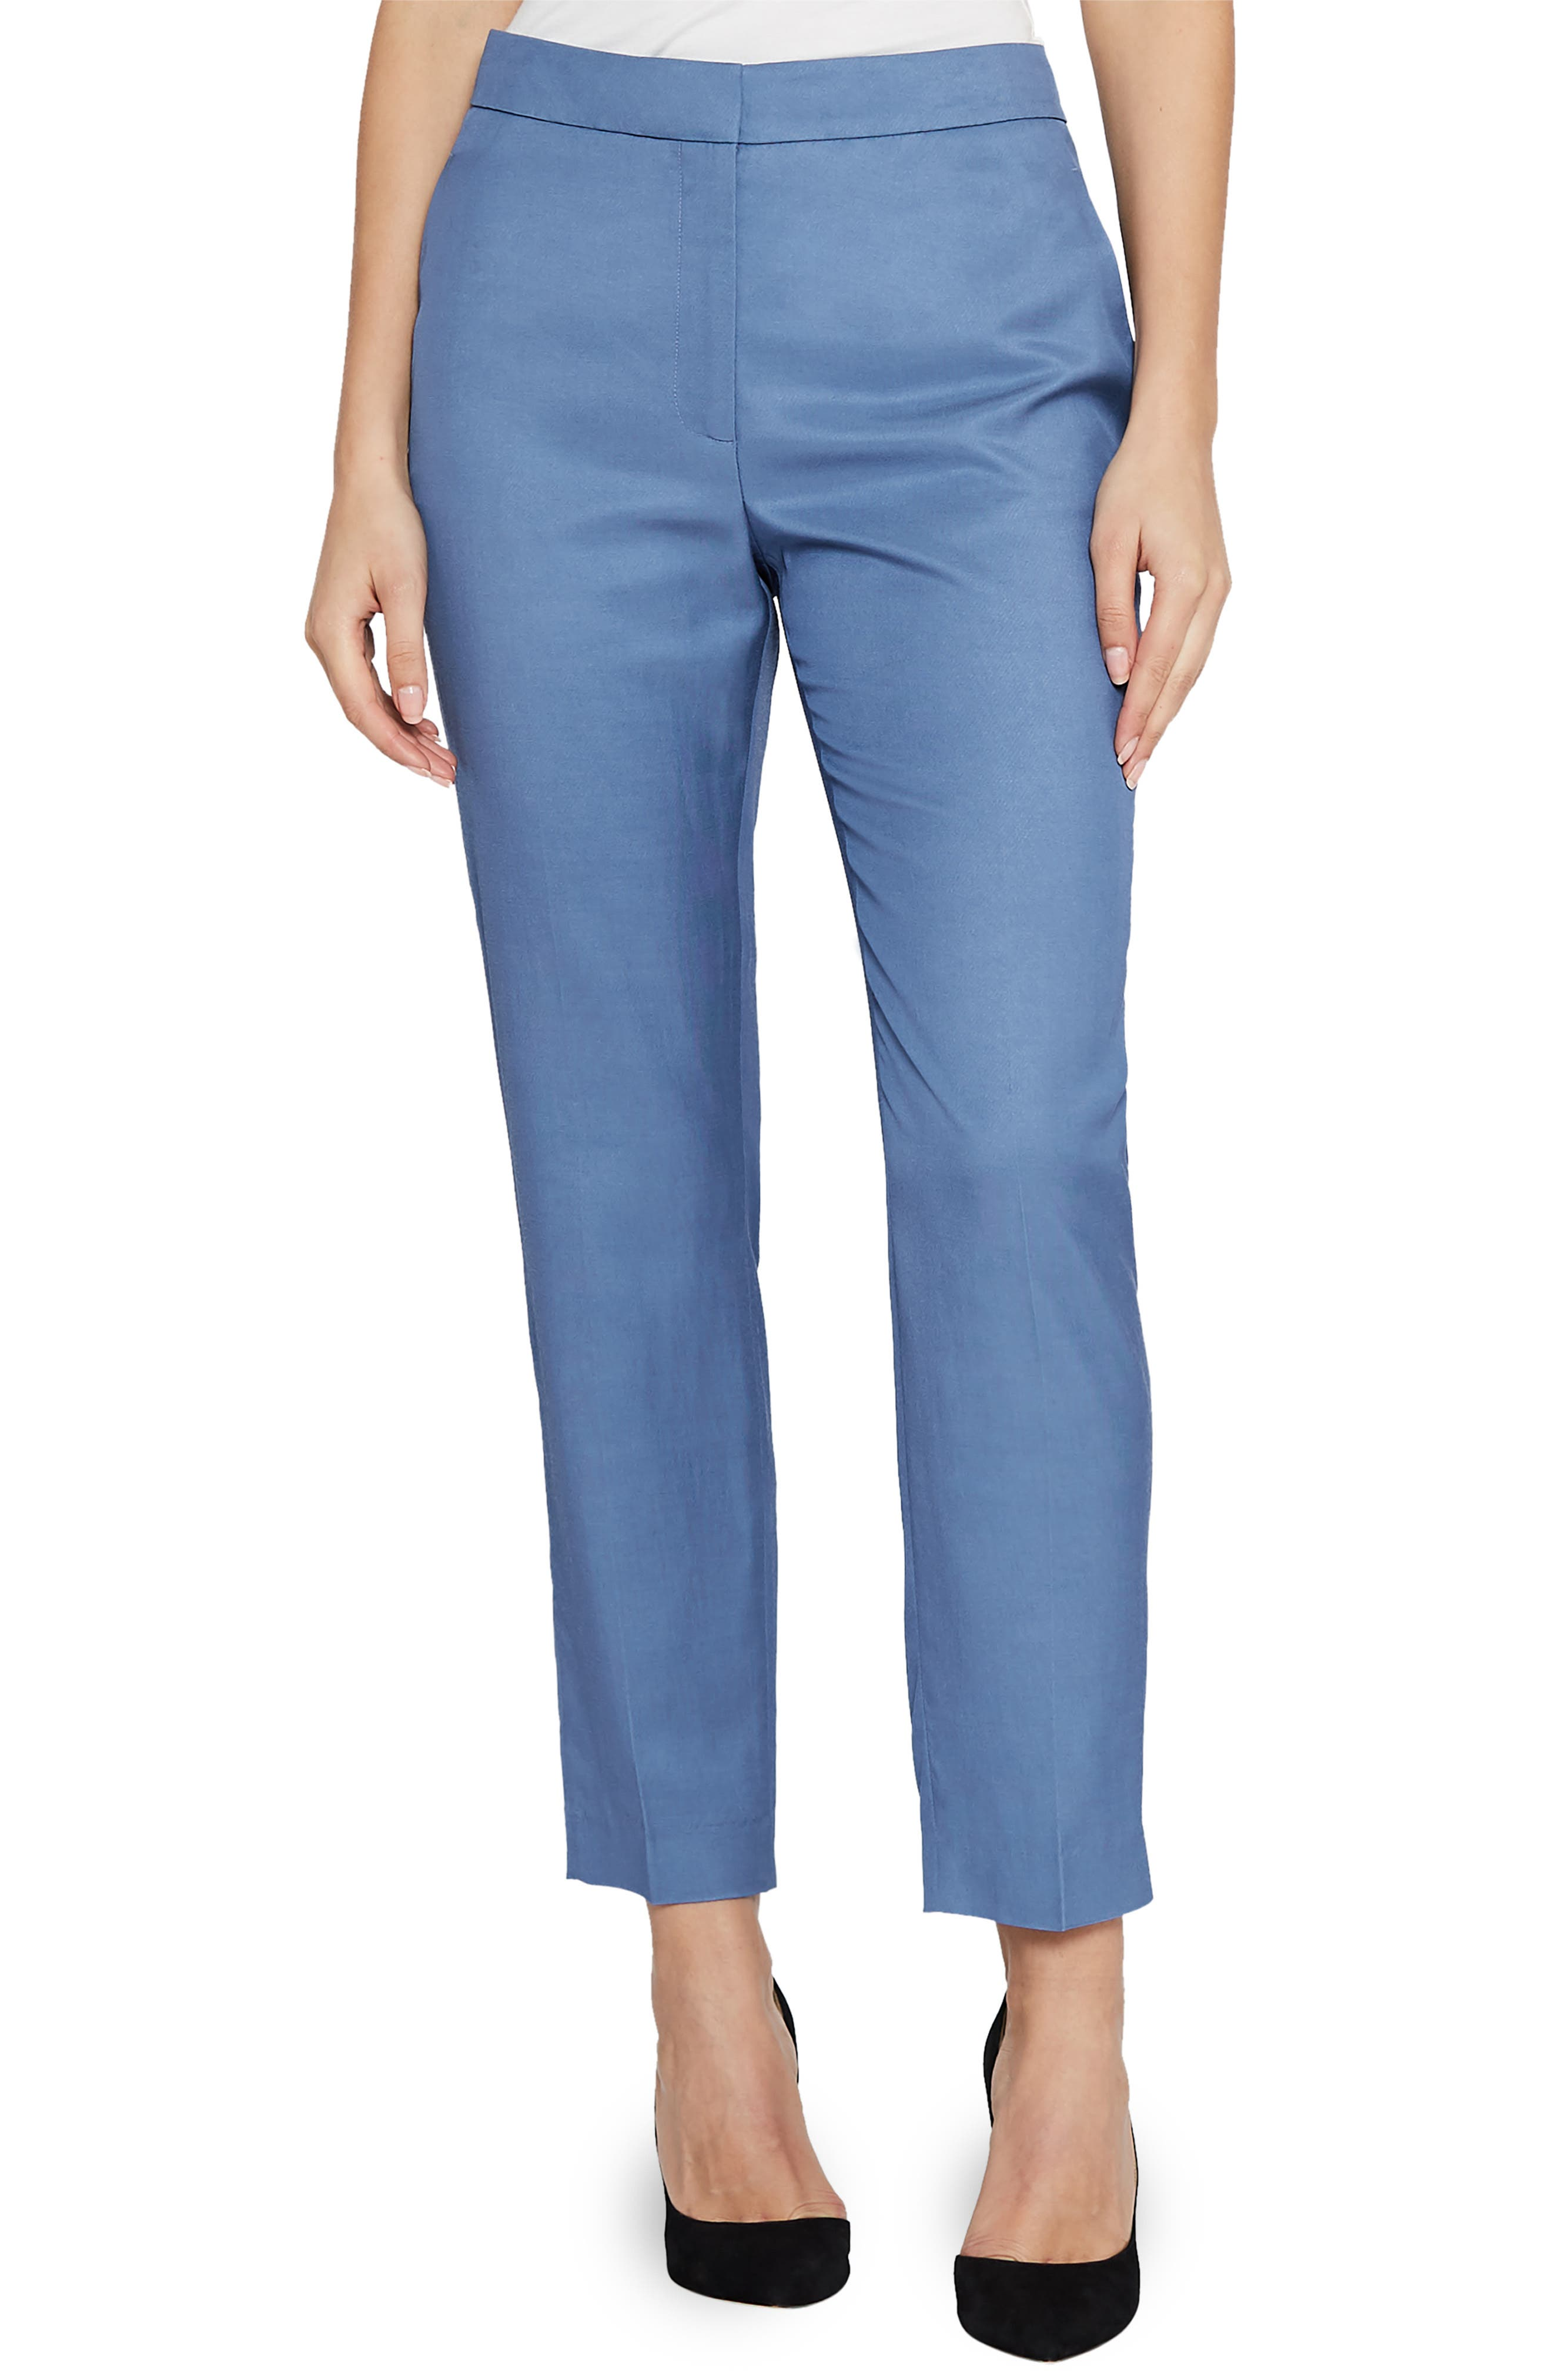 Etta Wool Blend Trousers,                             Main thumbnail 1, color,                             410